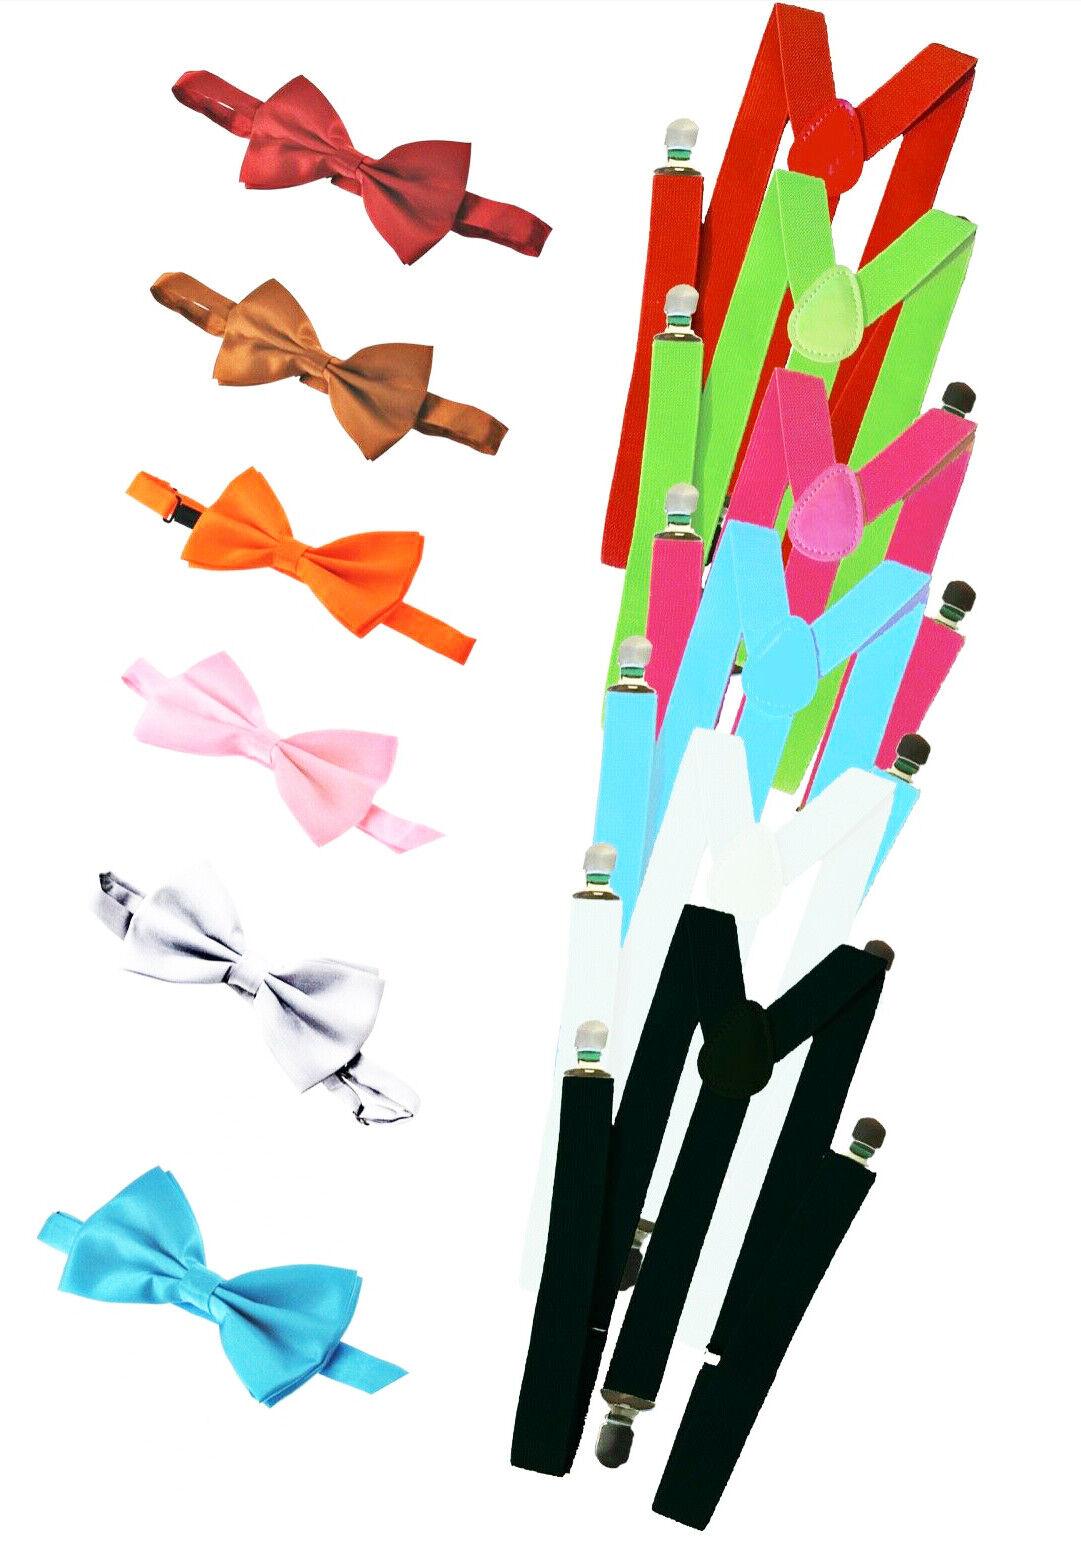 Hosenträger Jeans -Y Form 25mm 3 Clips Herren Damen Fliege Set Suspender Bow b4